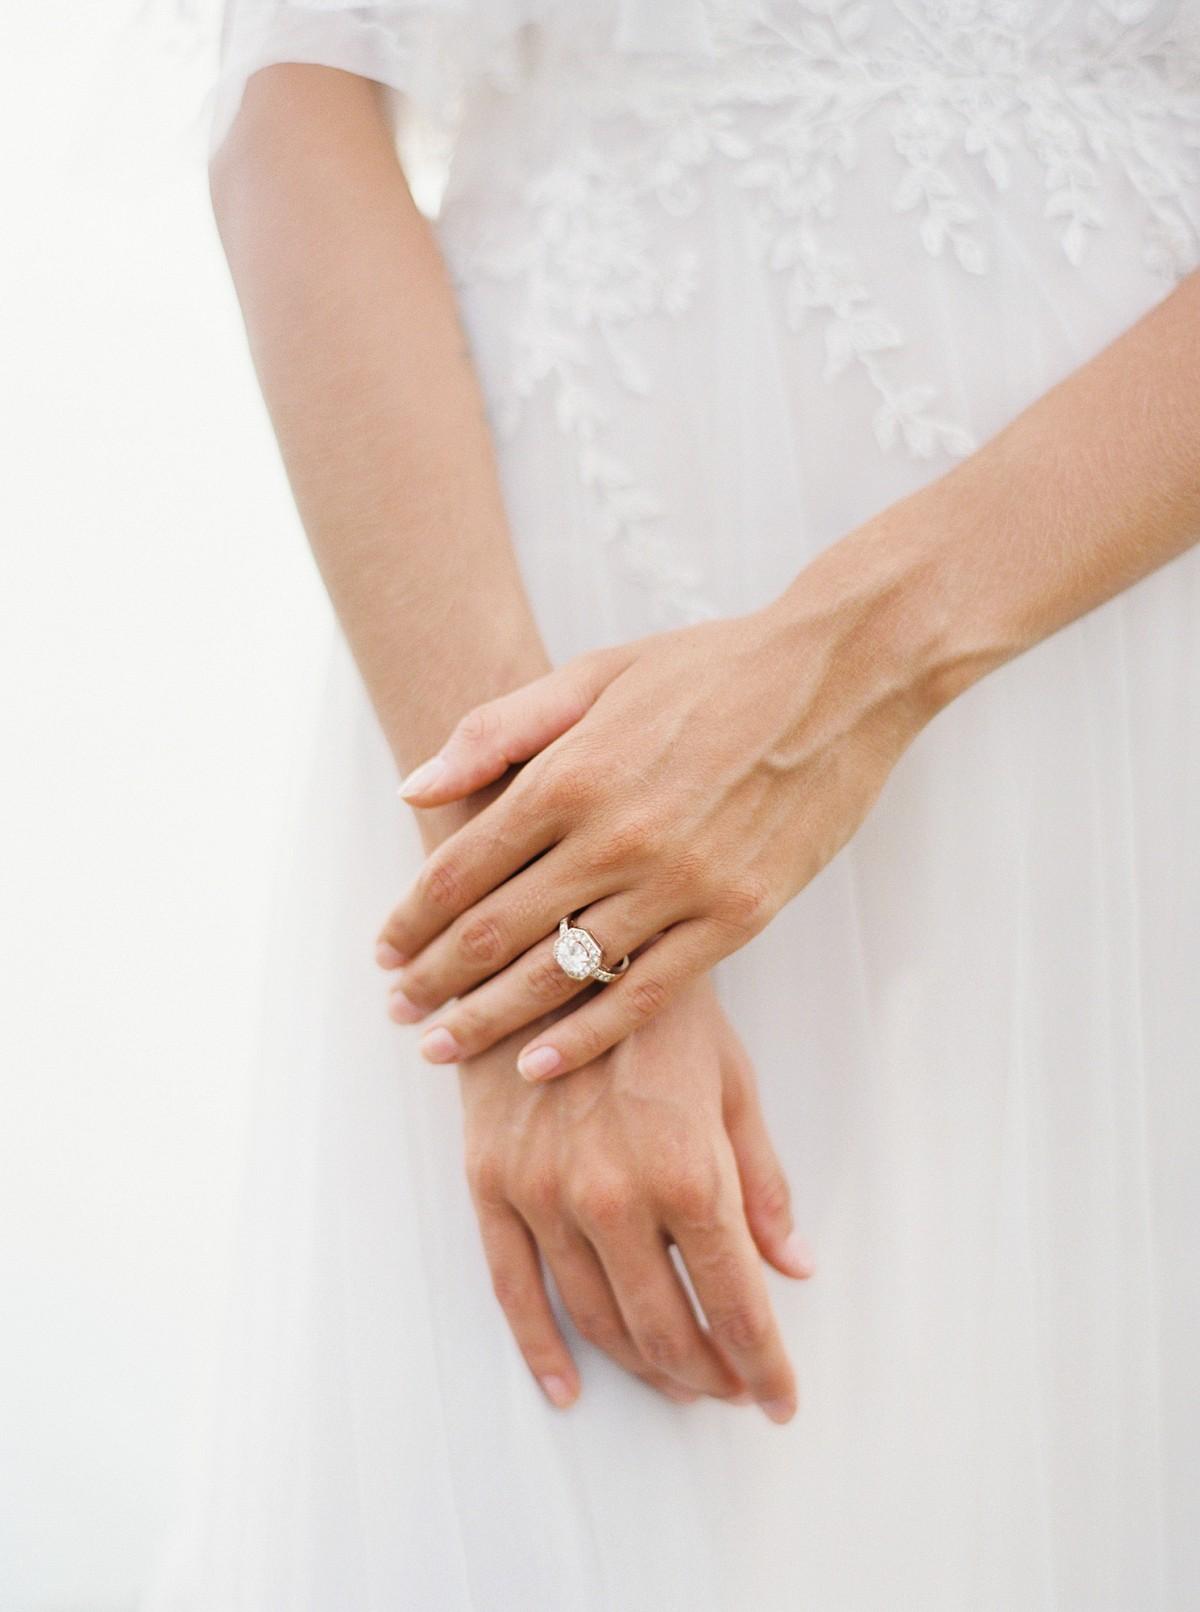 Bali Wedding Ideas with Colored Wedding Dress